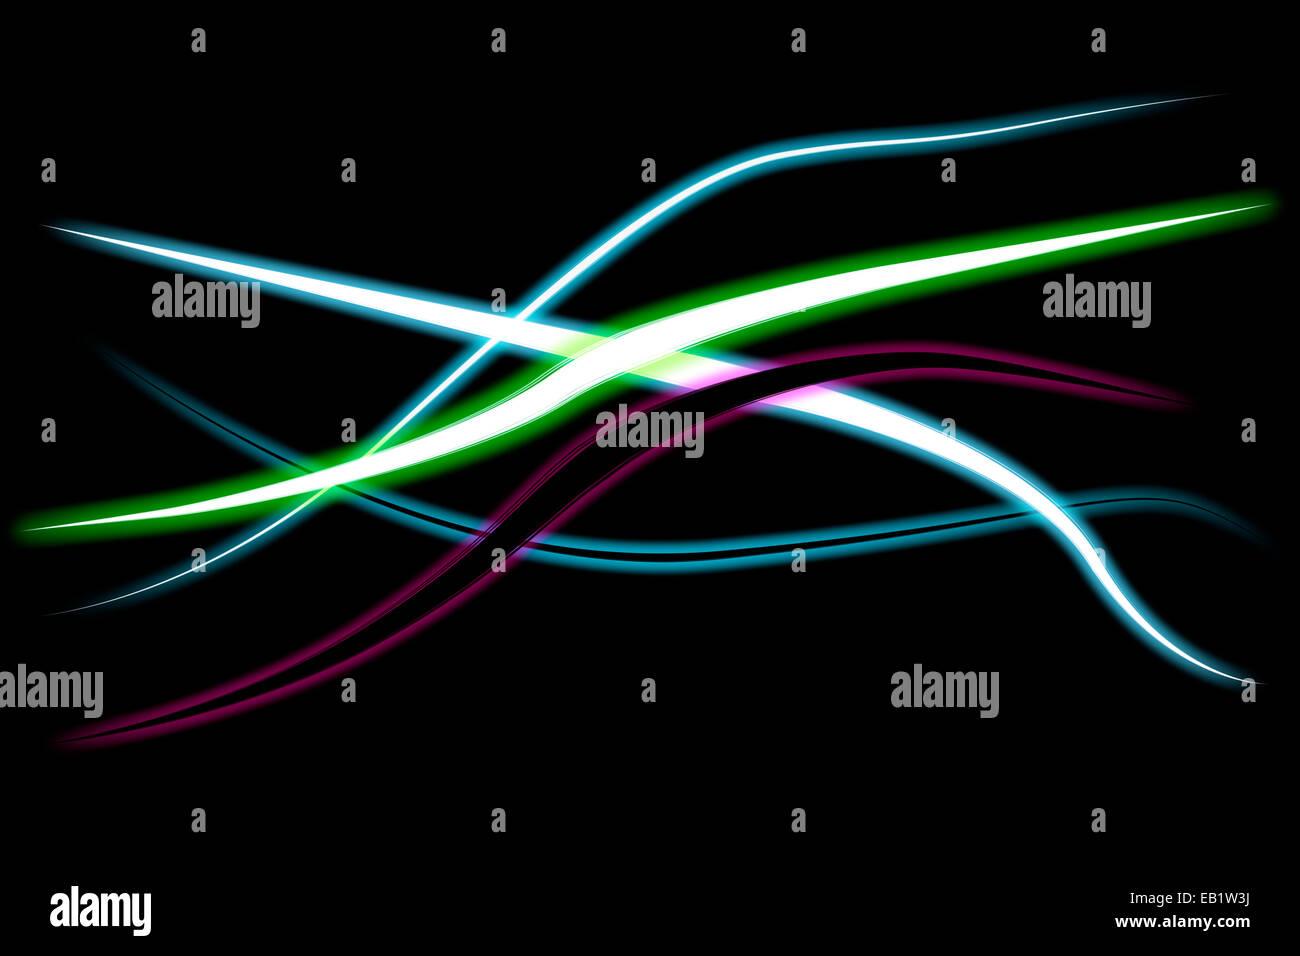 Formas abstracto multicolor fondos o texturas. Imagen De Stock